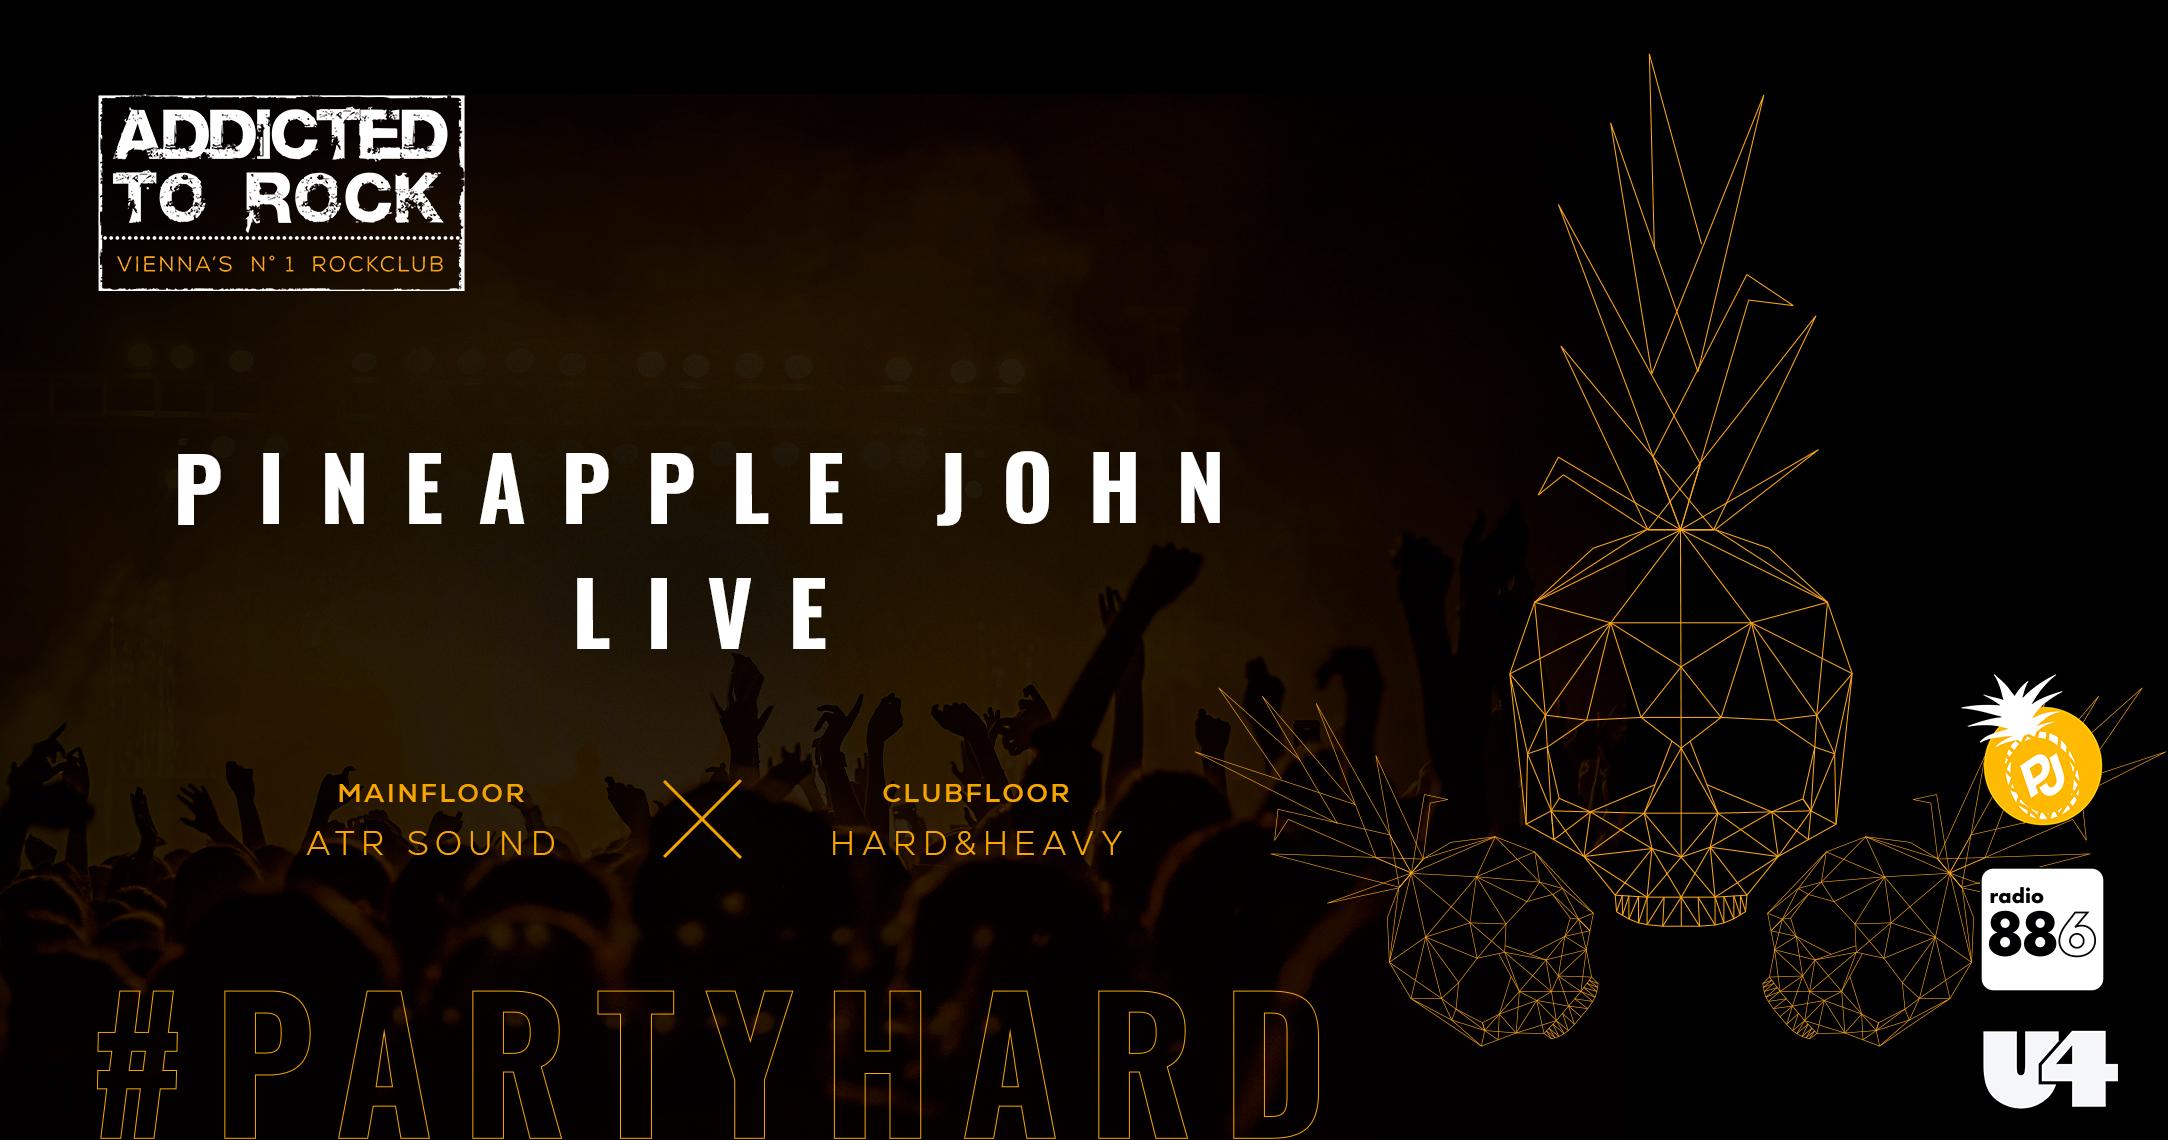 Addicted to Rock Pineapple John live